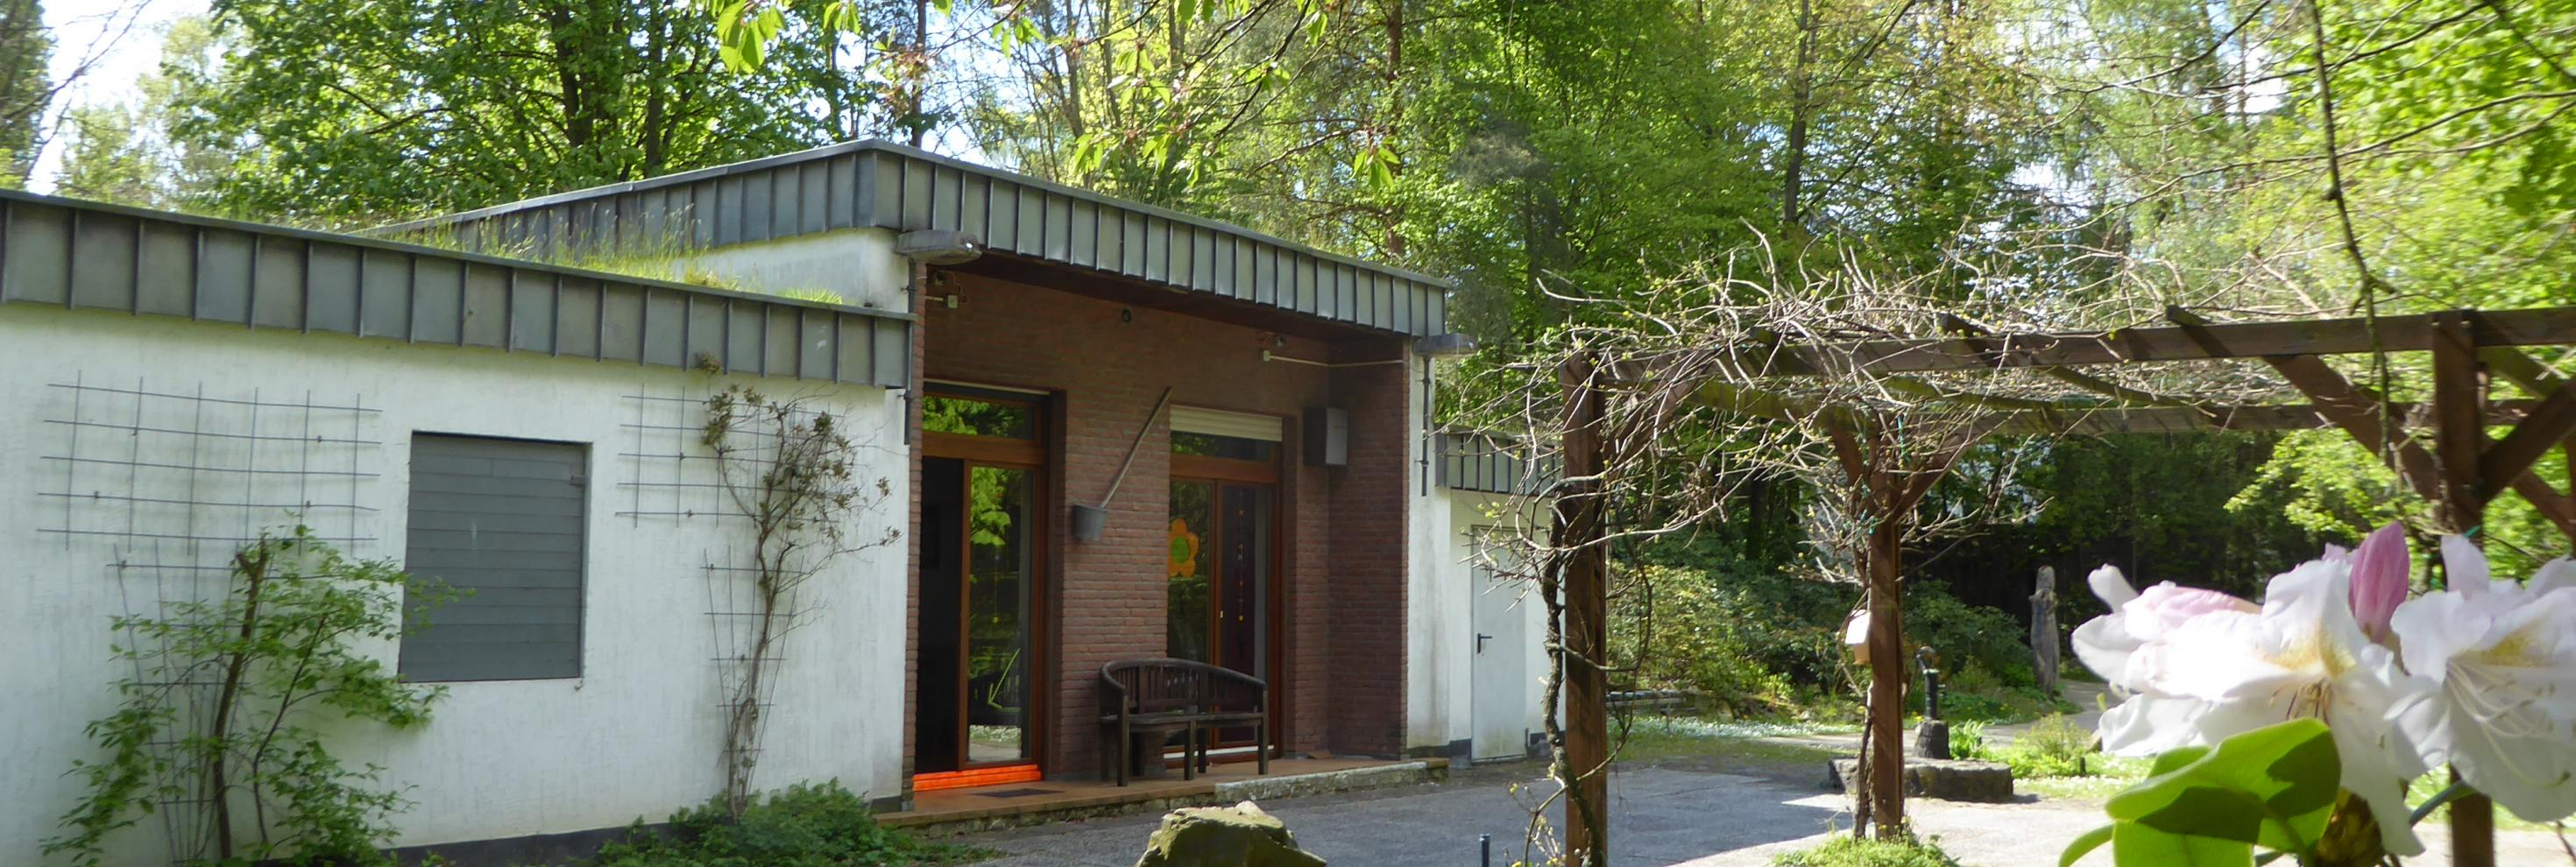 Naturfreundehaus-Merkstein